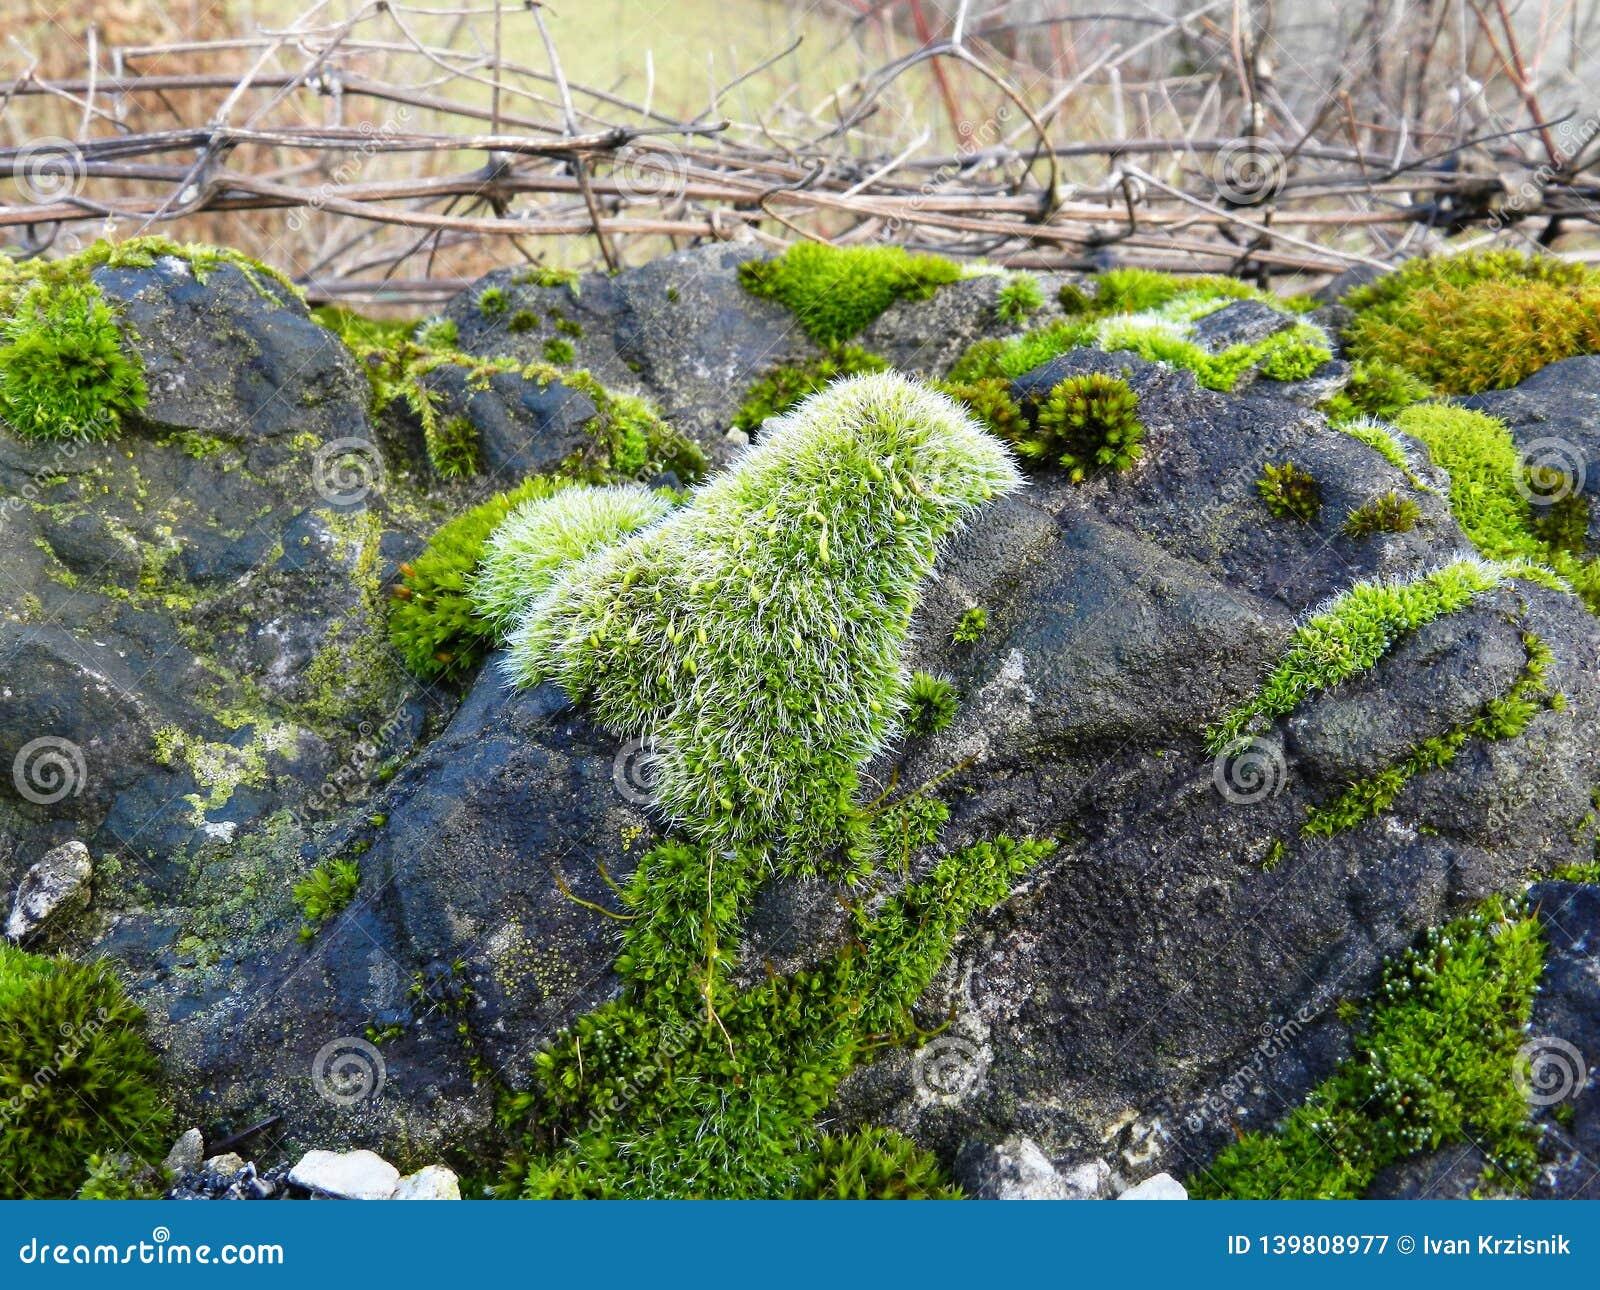 EbreljeСловения Å нашло каннелюры неандерталца